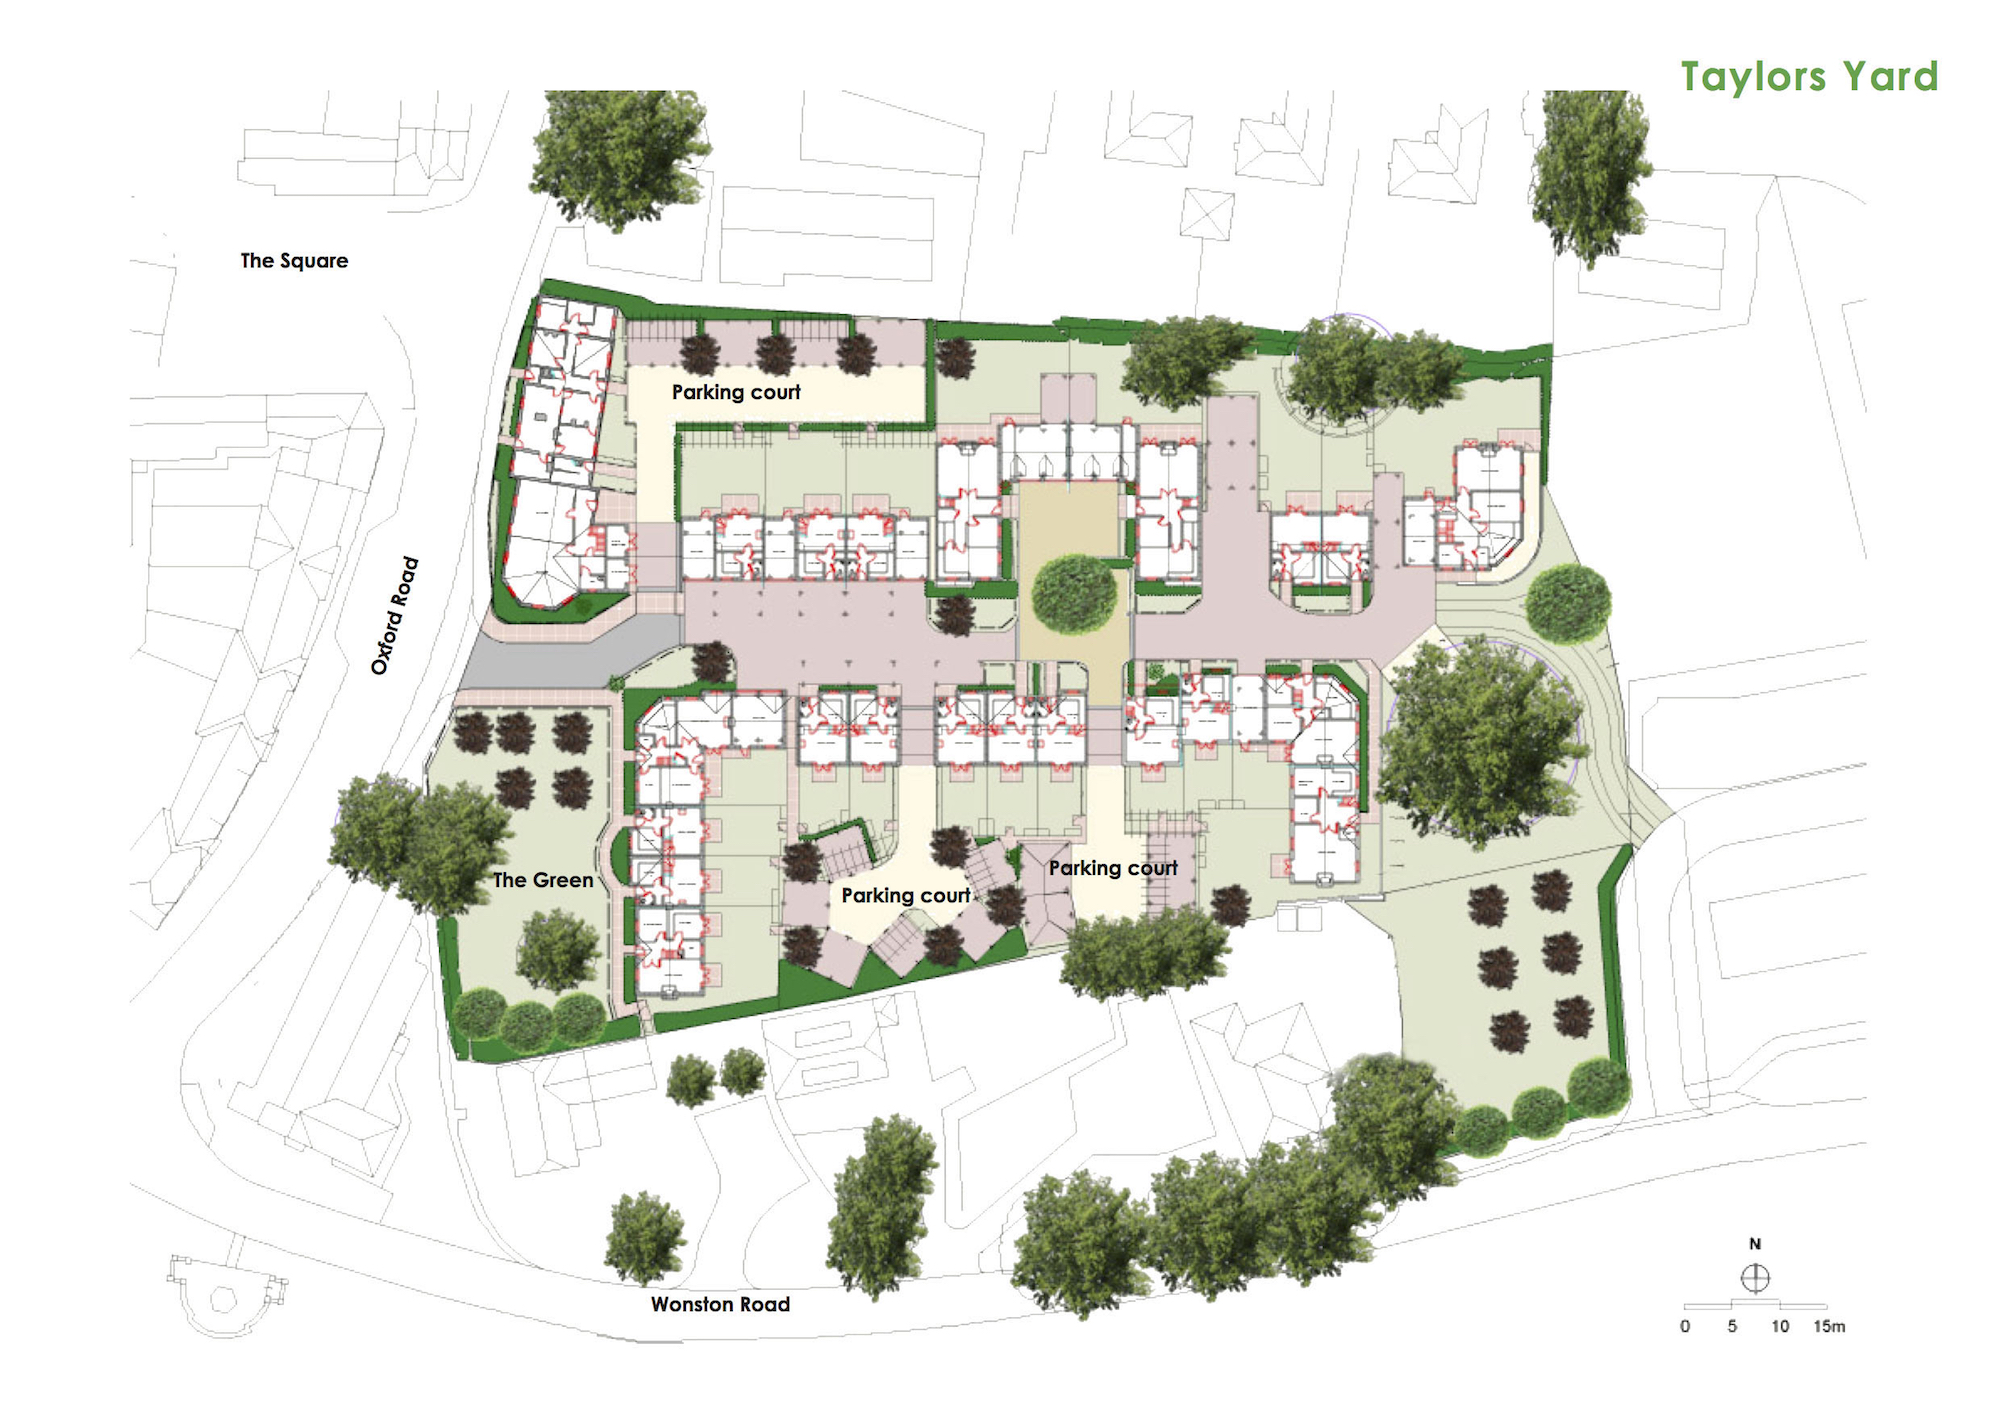 Taylors Yard plan.jpg